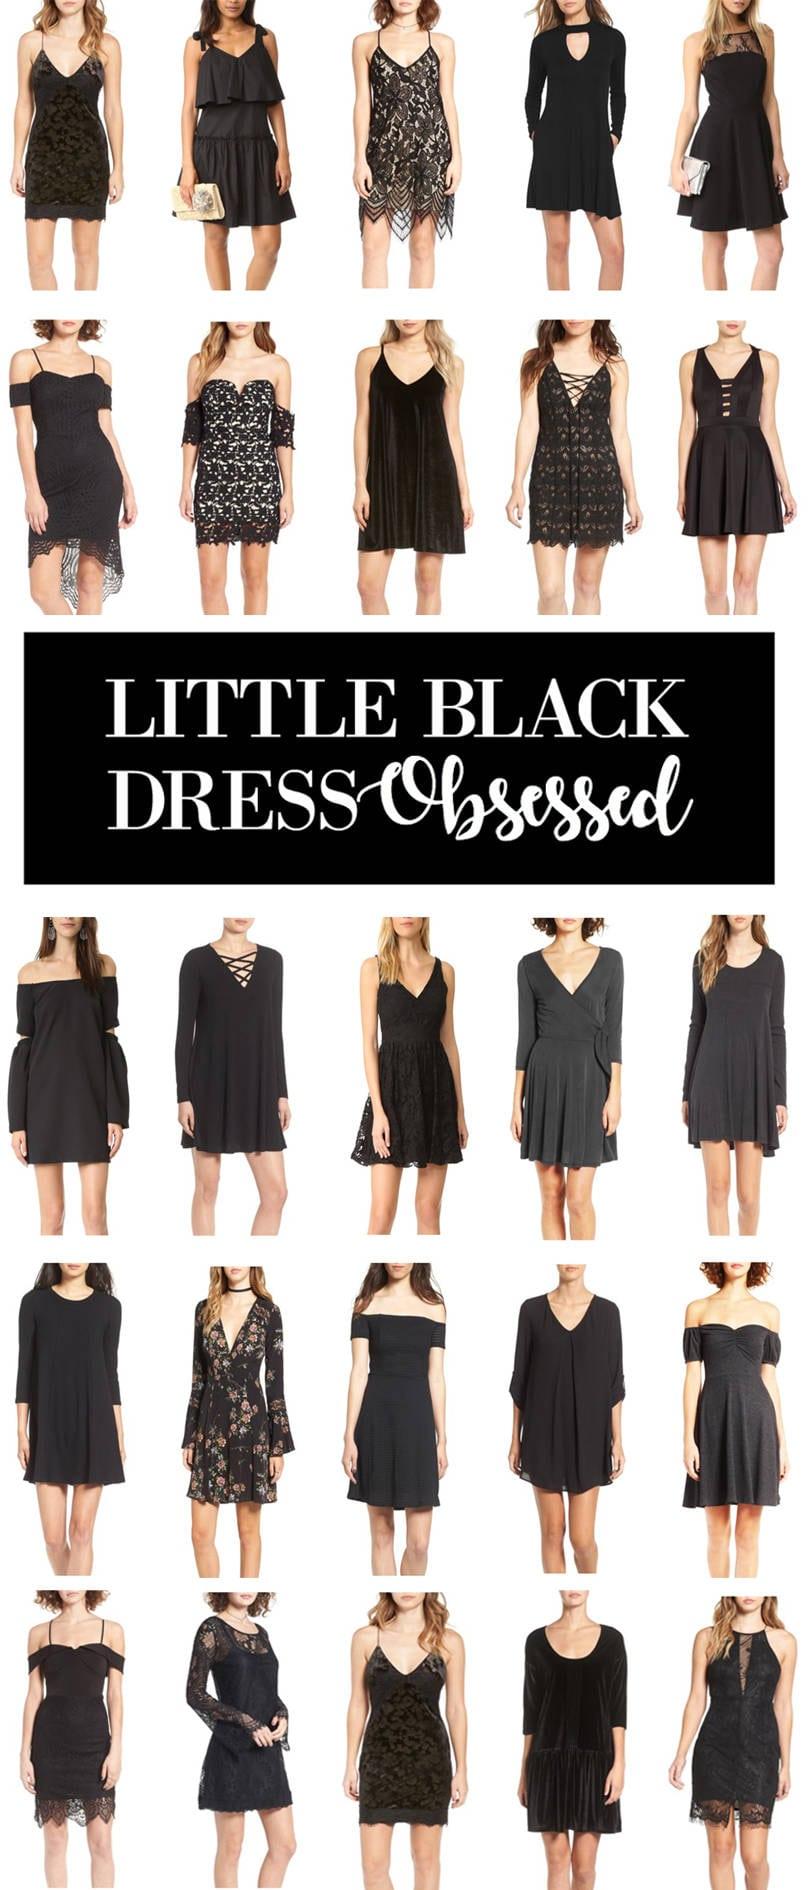 Little black dresses | dresses | LBD | date dress | Orlando beauty blogger Mash Elle